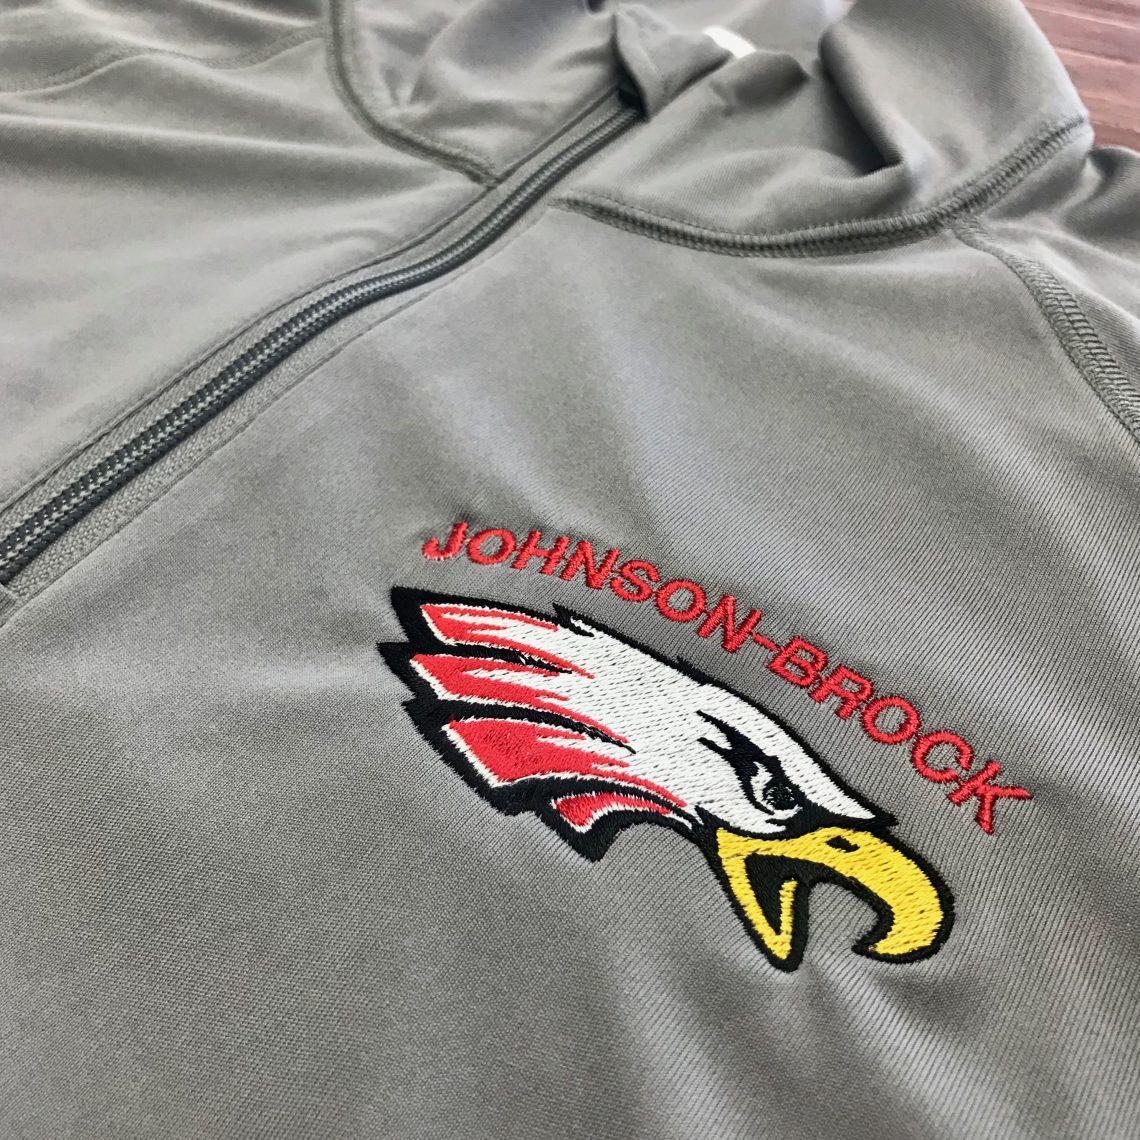 Custom Embroidery in Nebraska - Embroider Your Life! | Shirt Shack